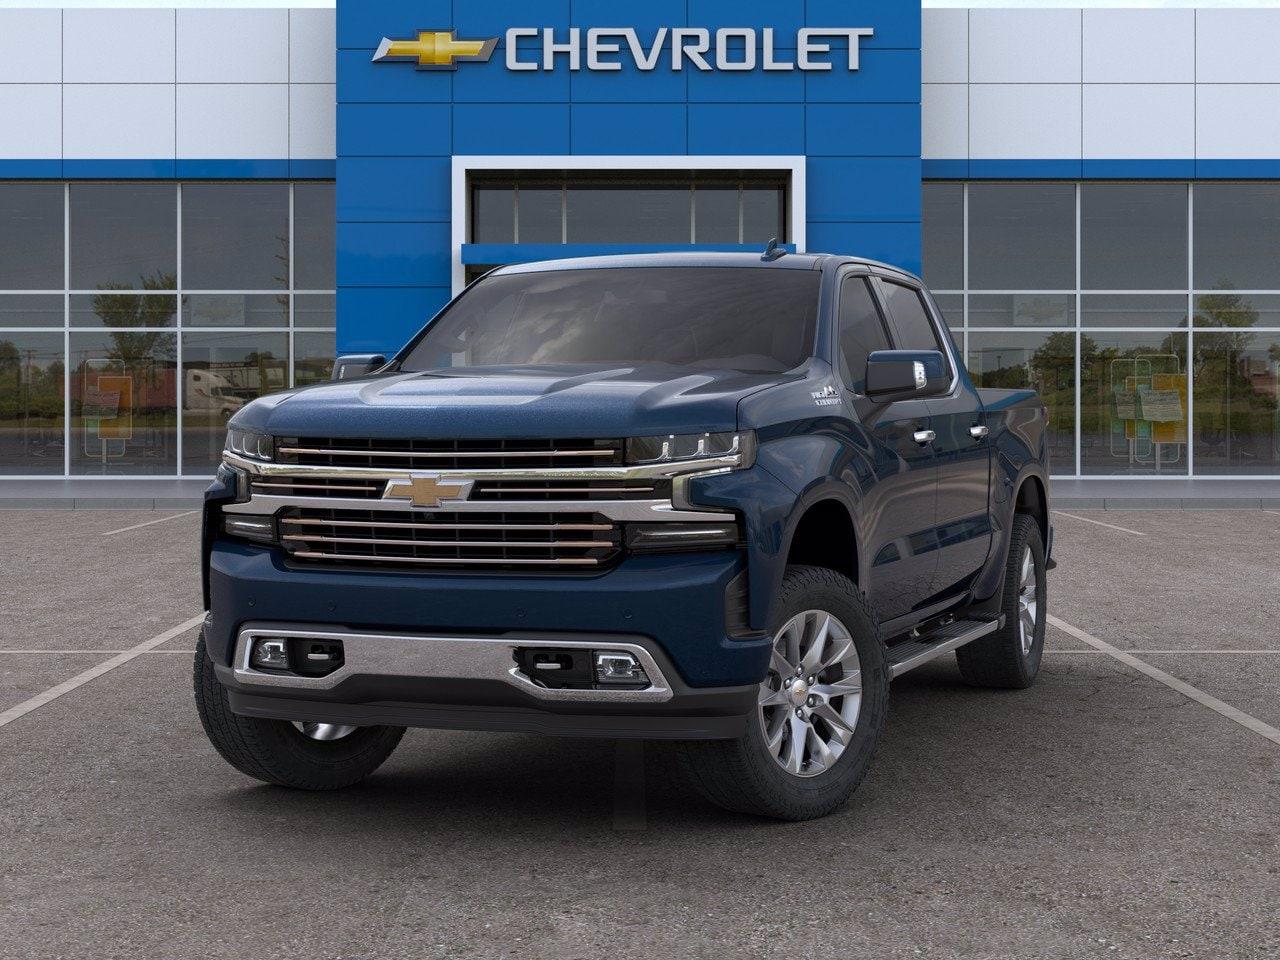 2020 Chevrolet Silverado 1500 Crew Cab 4x4, Pickup #C201648 - photo 6